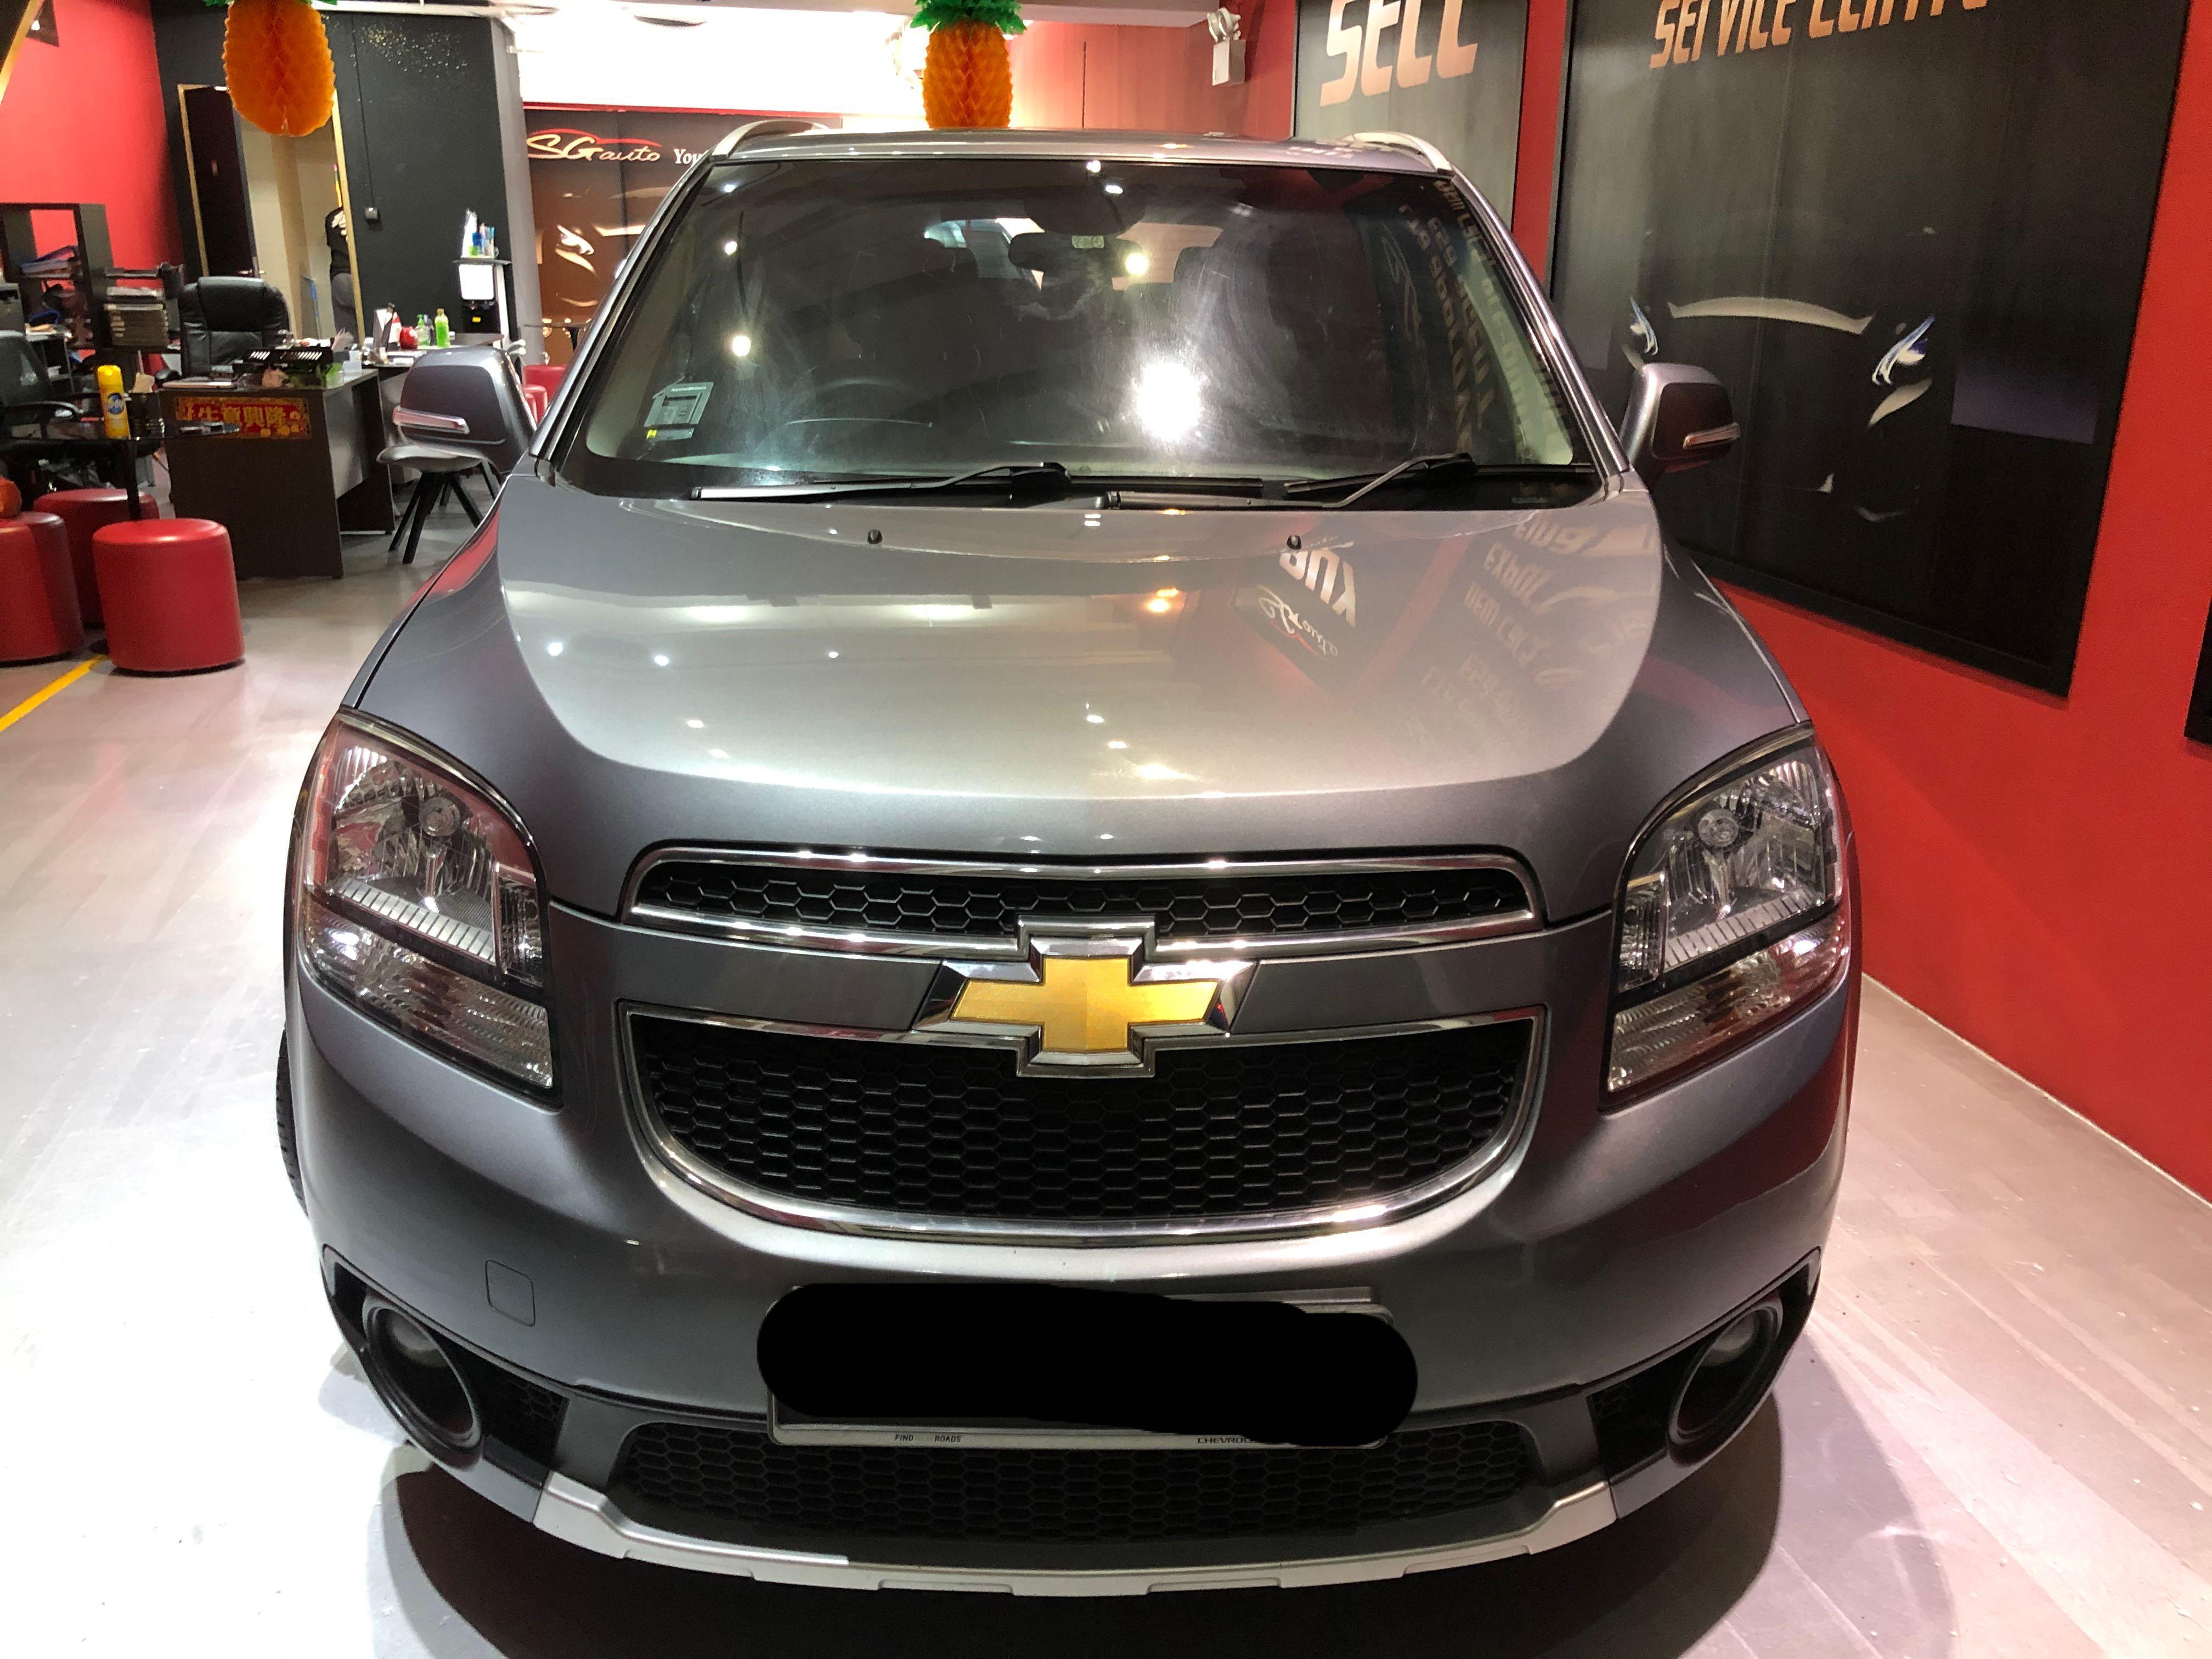 Chevrolet Orlando 1.4 Turbo LS (A)